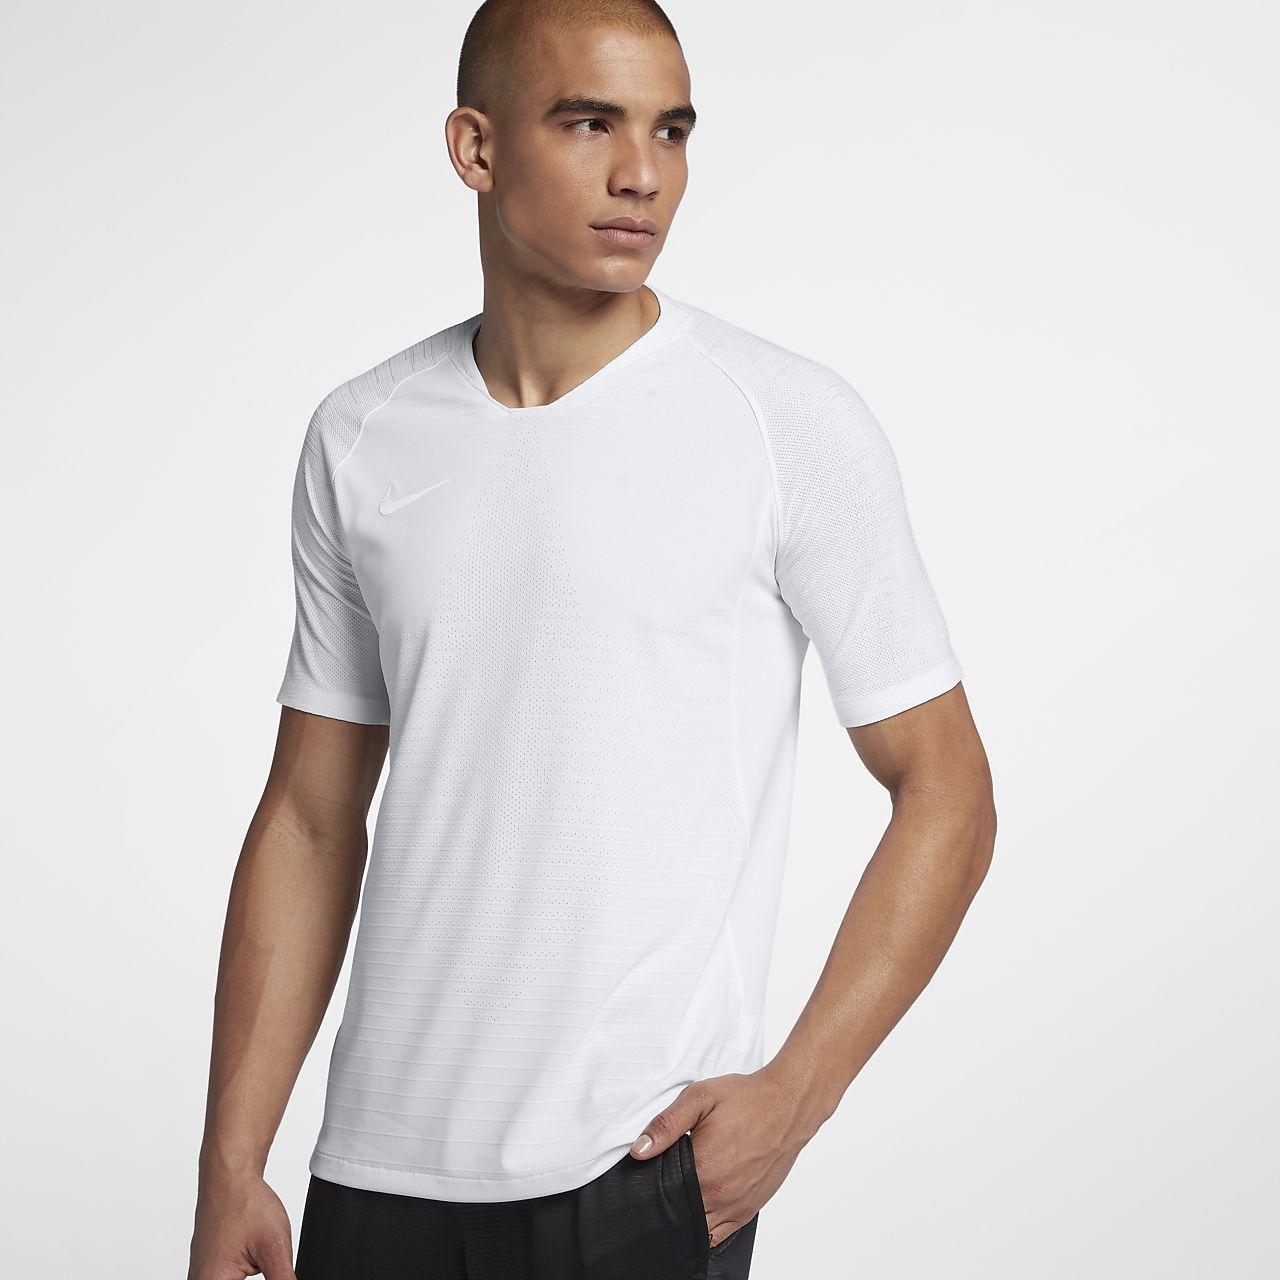 ab7c674f Nike VaporKnit Strike Men's Short-Sleeve Football Top. Nike.com DK